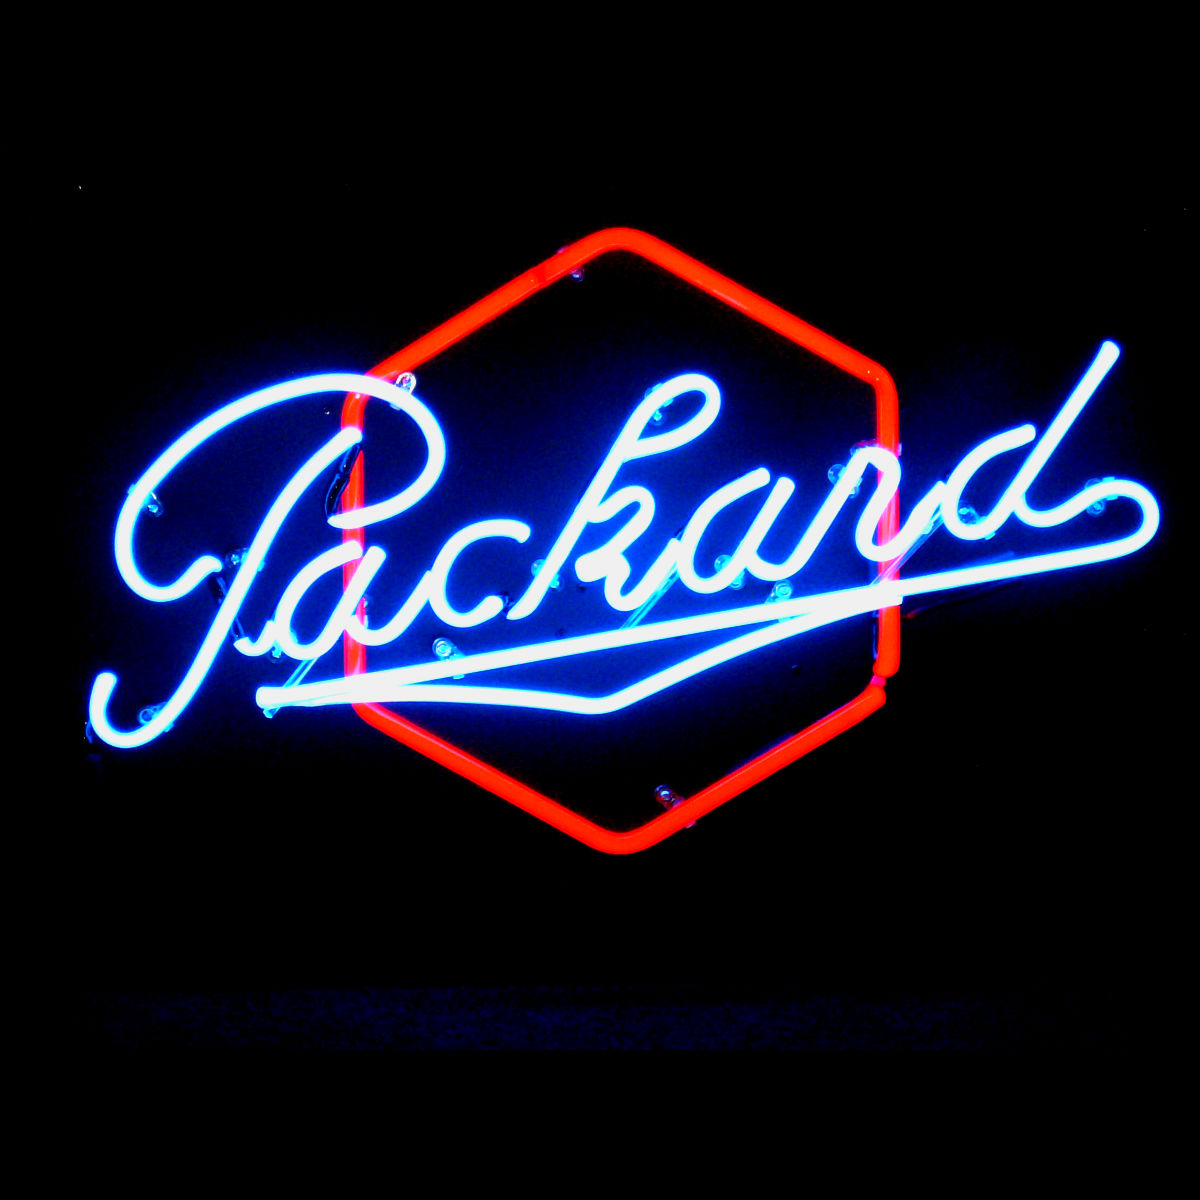 Packard Neon Signs by former New Packard Dealer